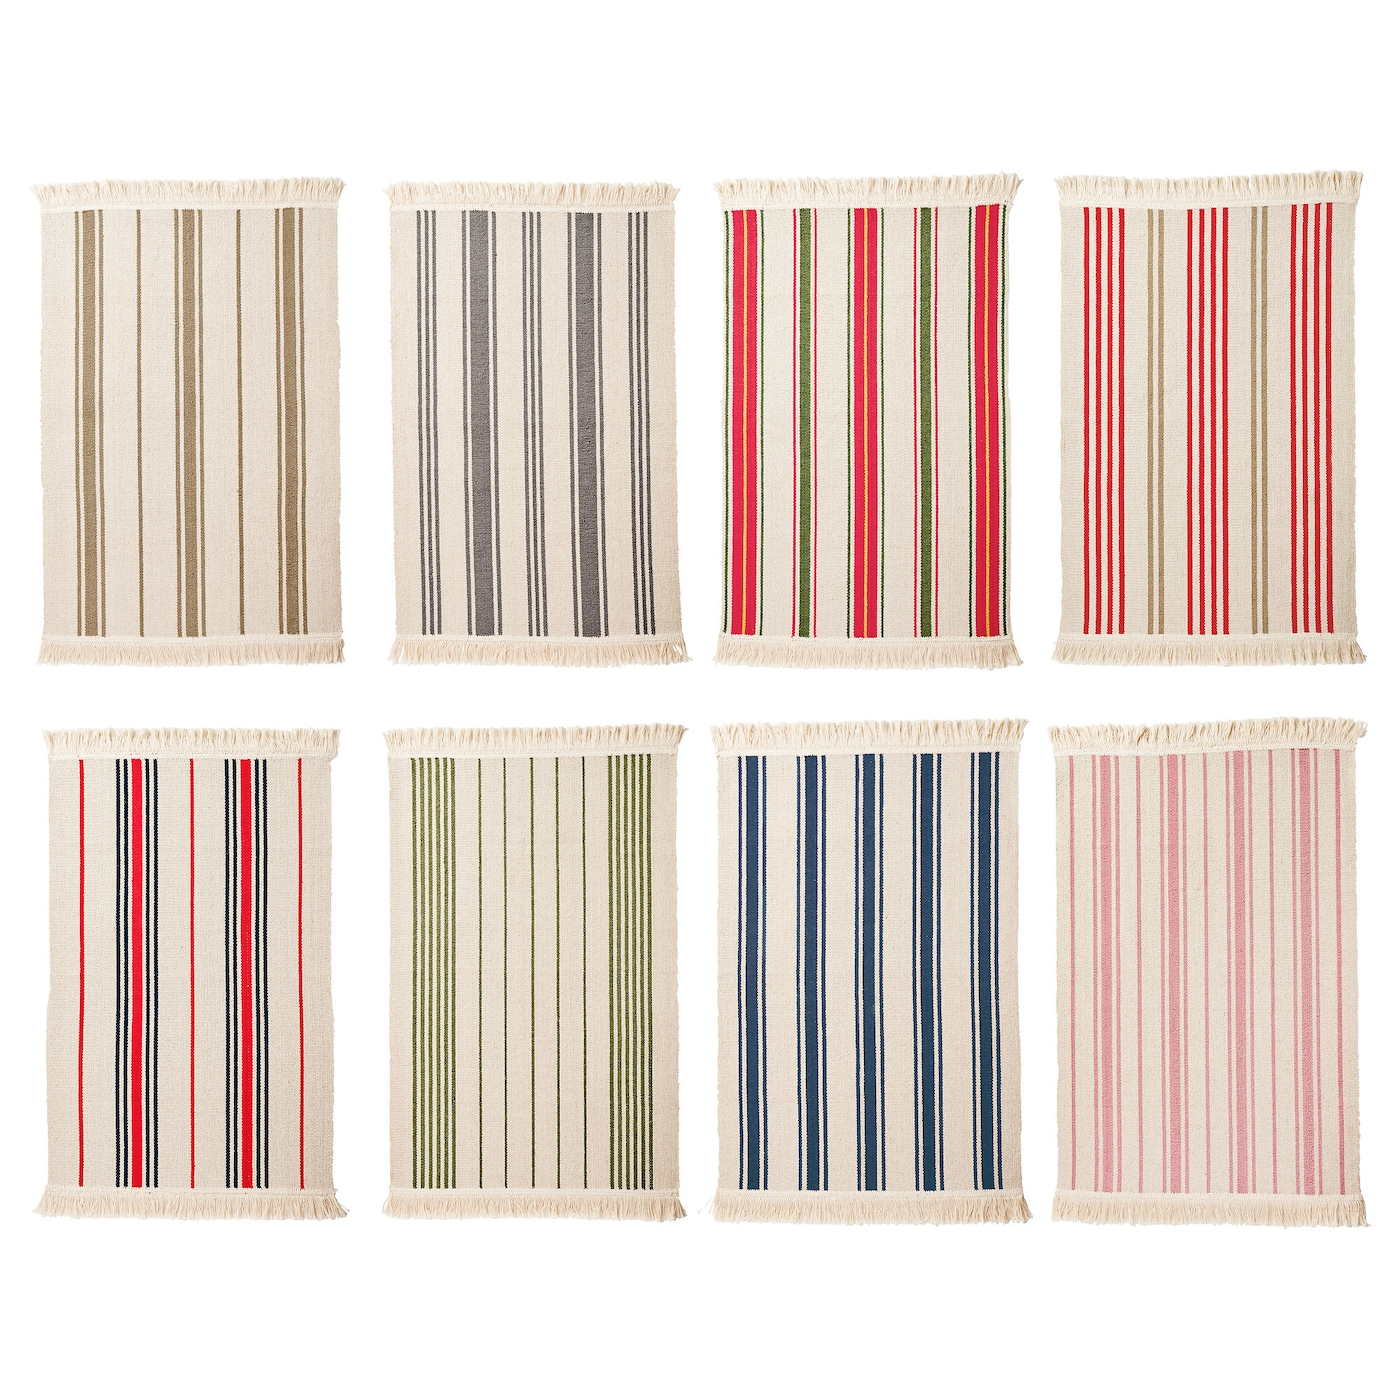 signe tapis tiss plat coloris assortis 55 x 85 cm ikea. Black Bedroom Furniture Sets. Home Design Ideas